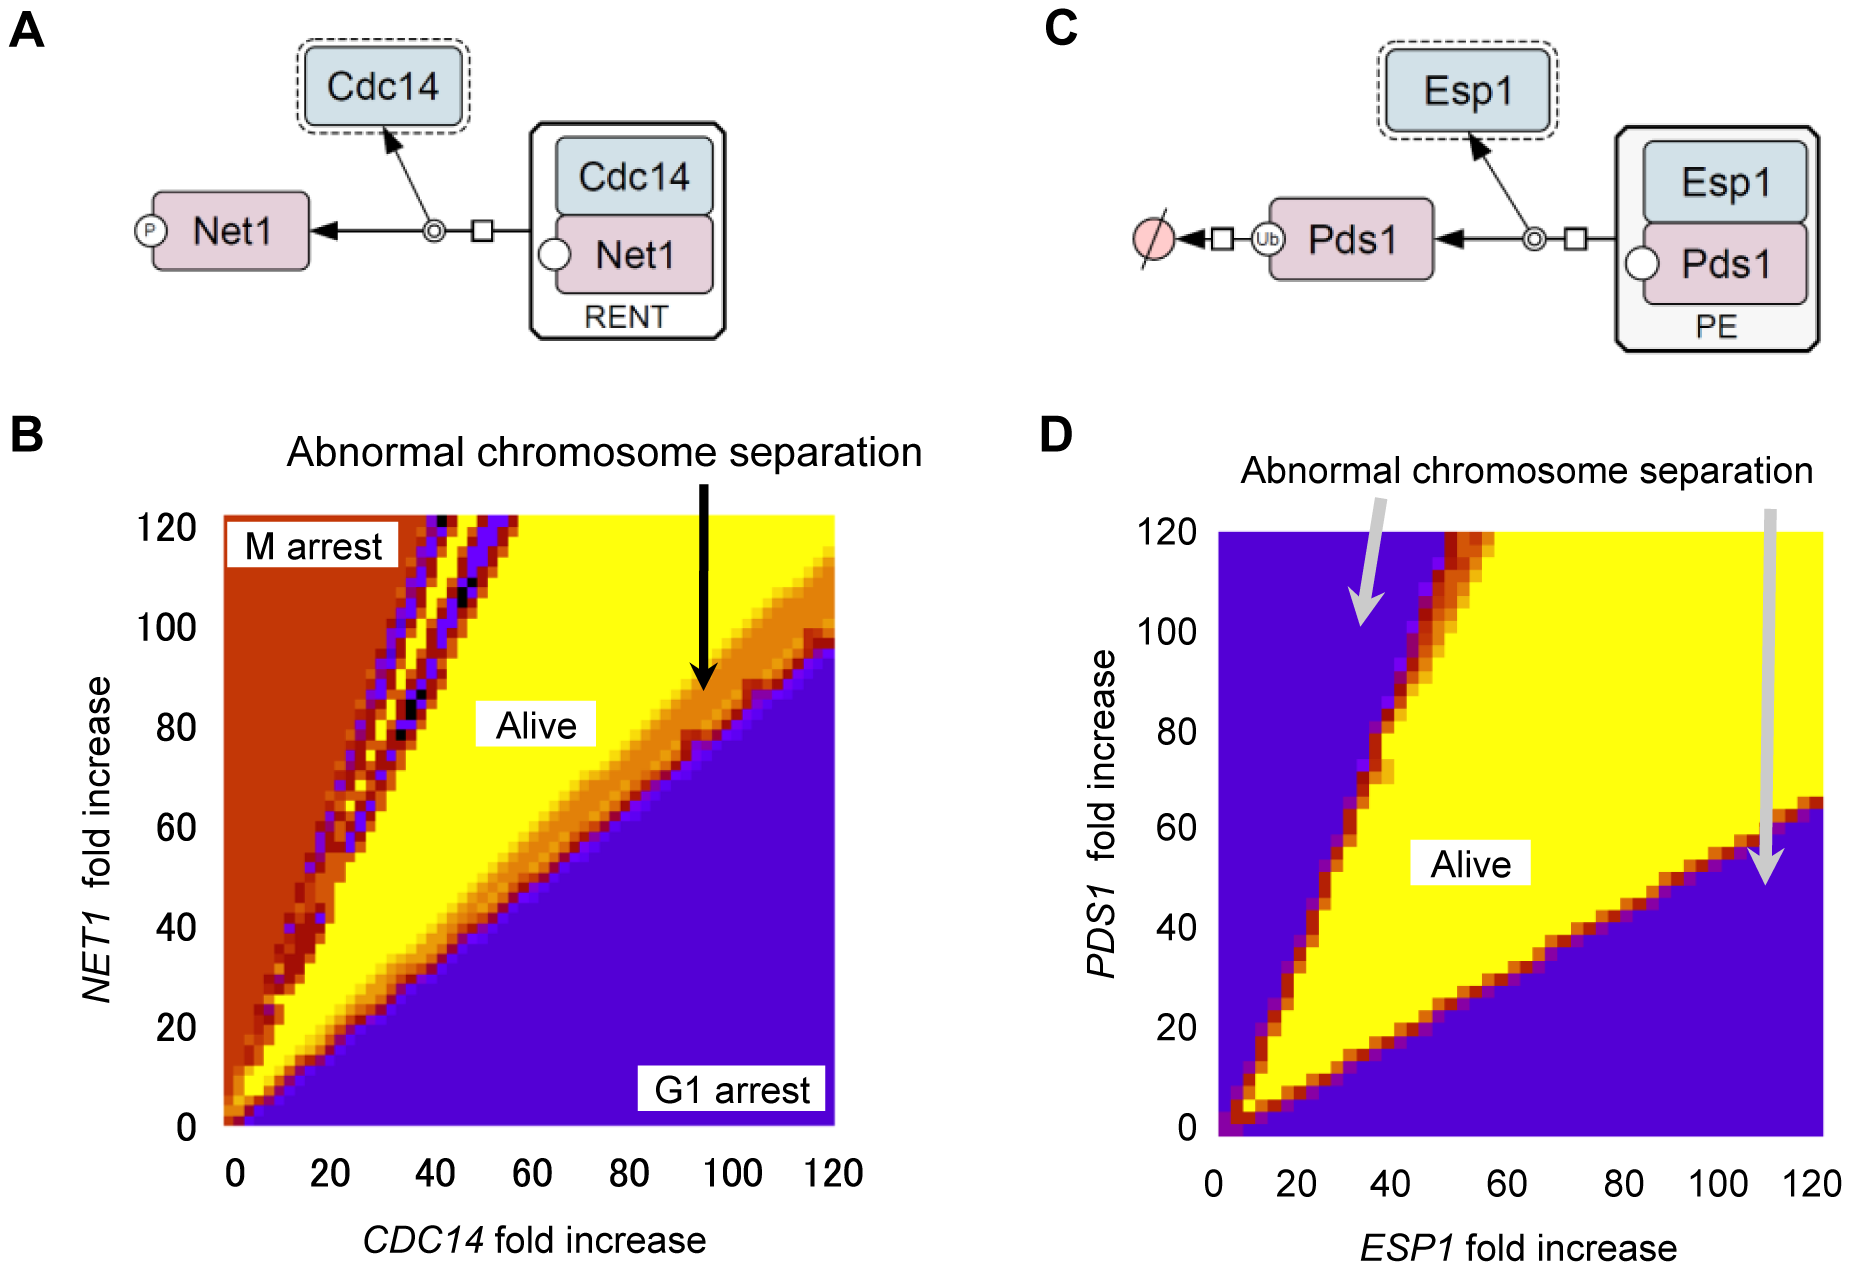 Computational analysis of quantitative relationship between <i>CDC14</i> and <i>NET1</i> as well as <i>ESP1</i> and <i>PDS1</i>.